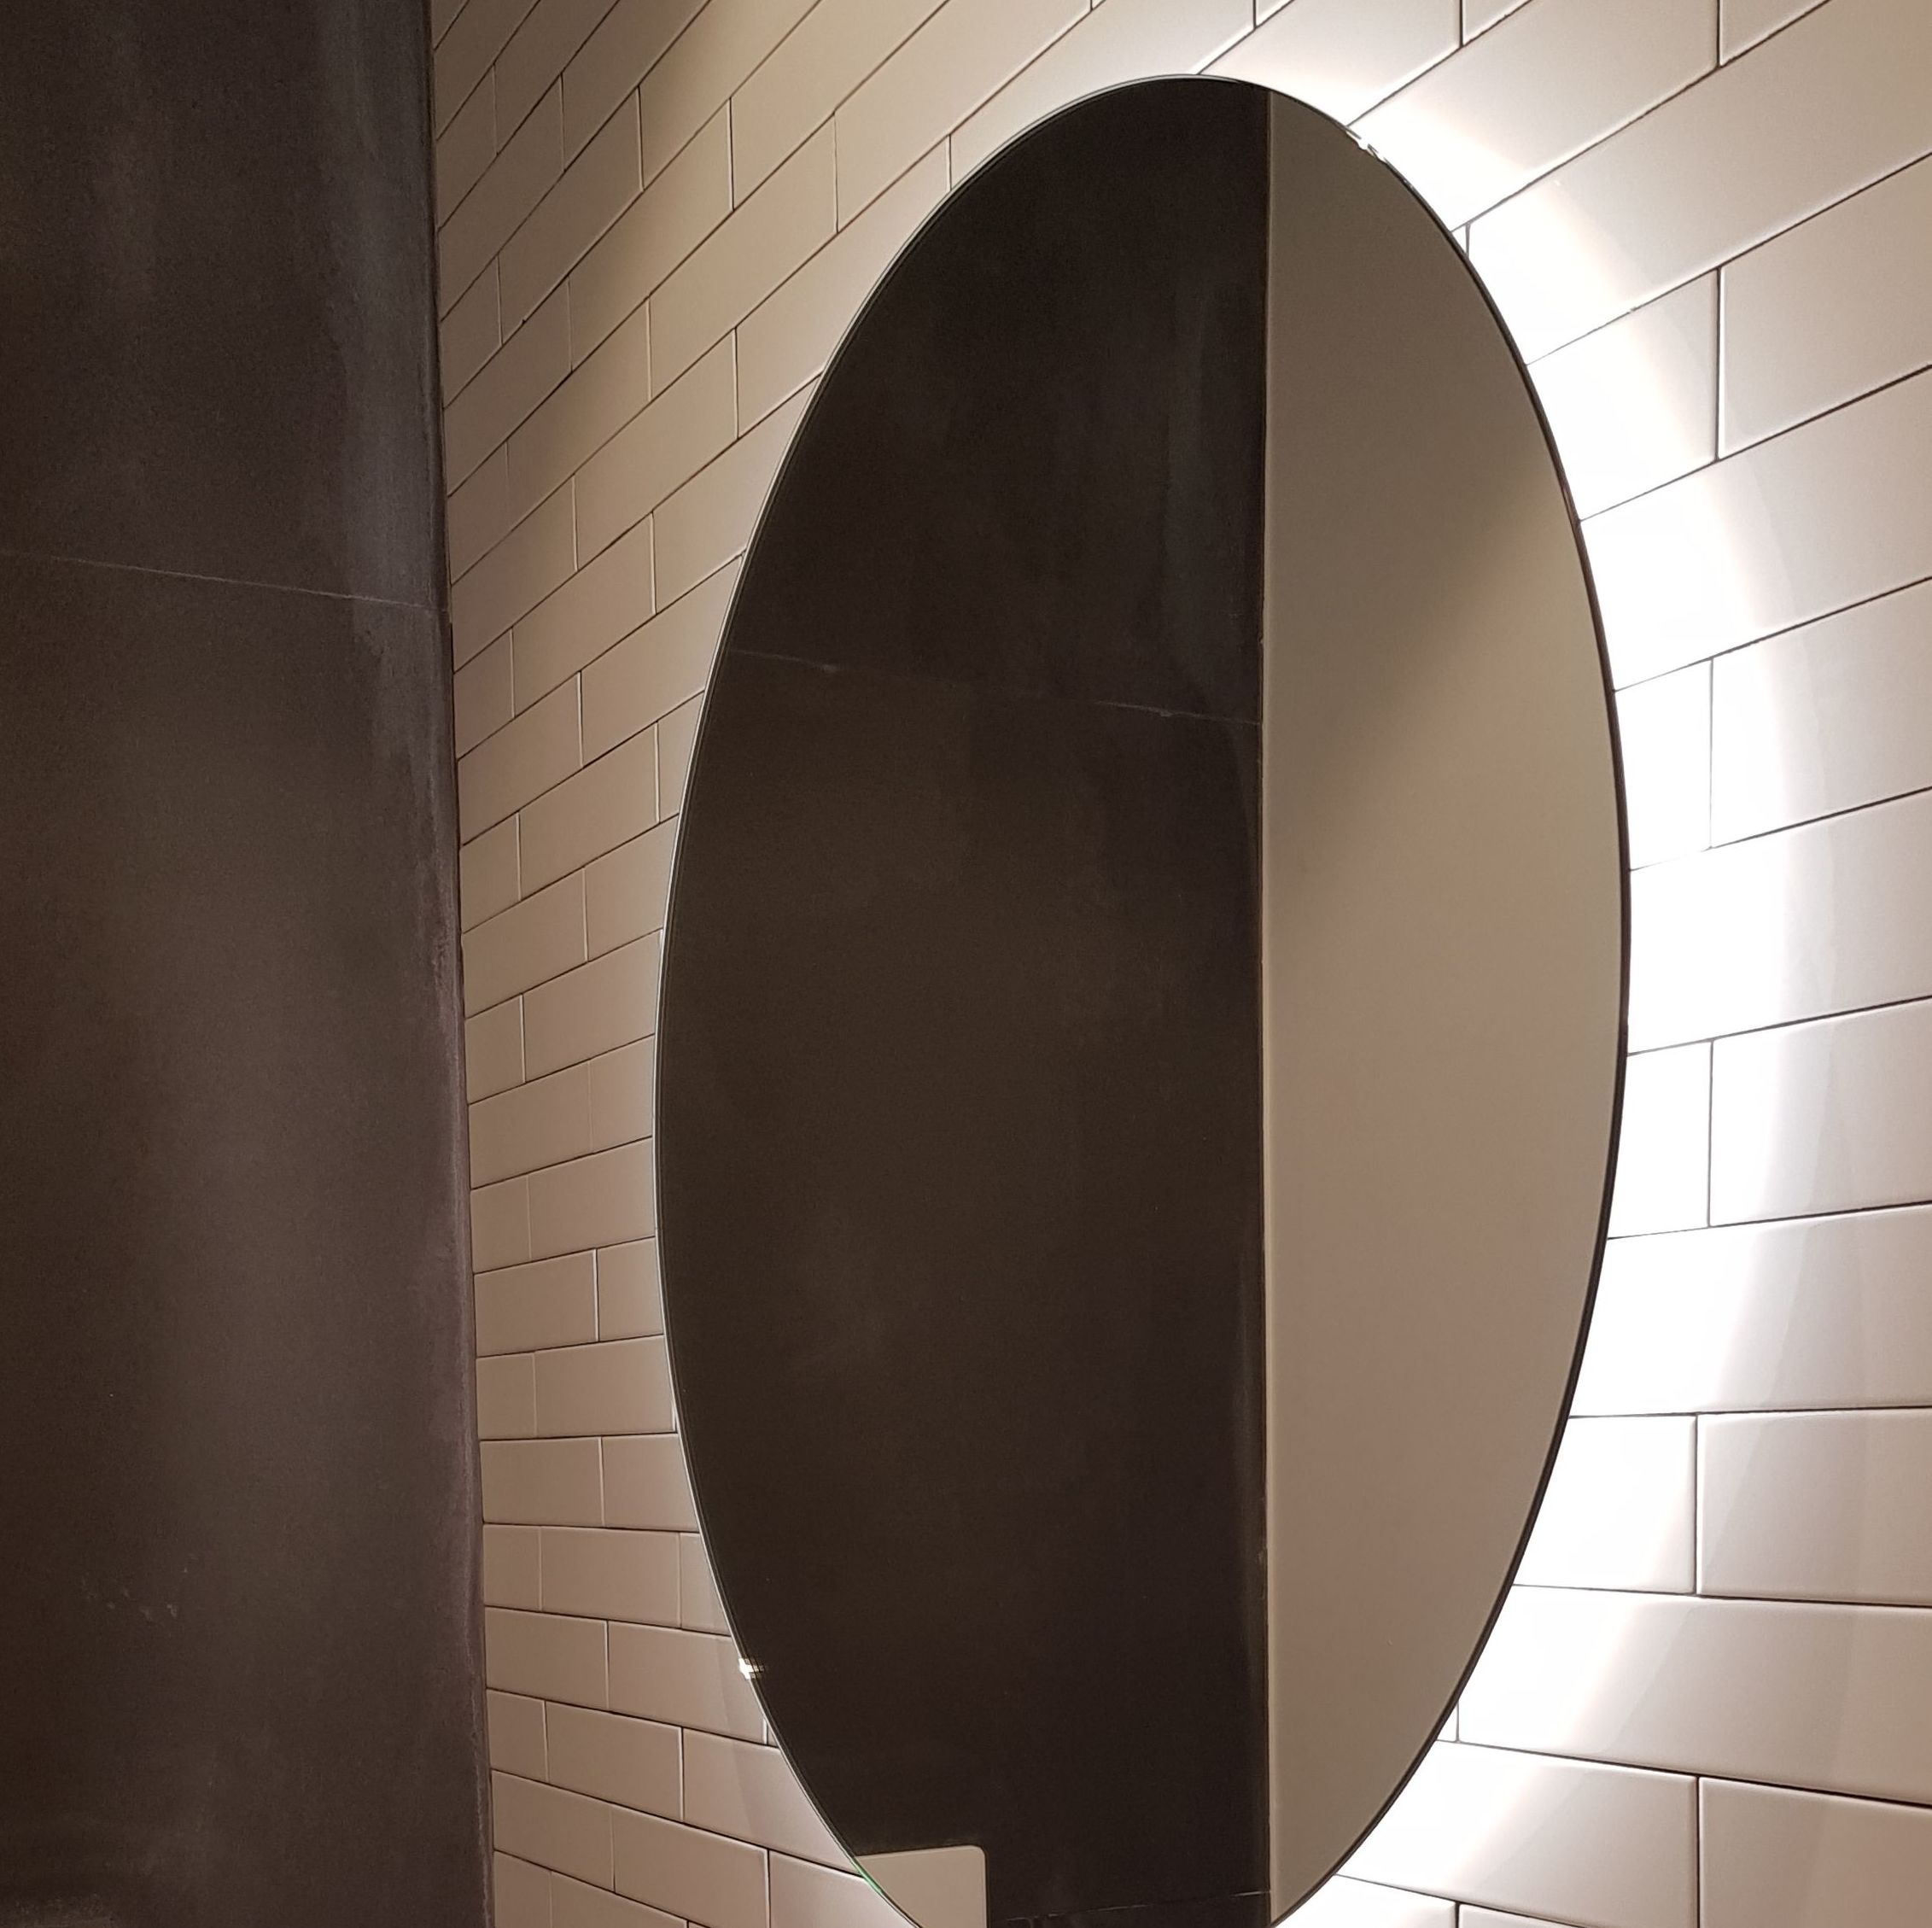 cristaleria-formas-espejo-retroiluminado